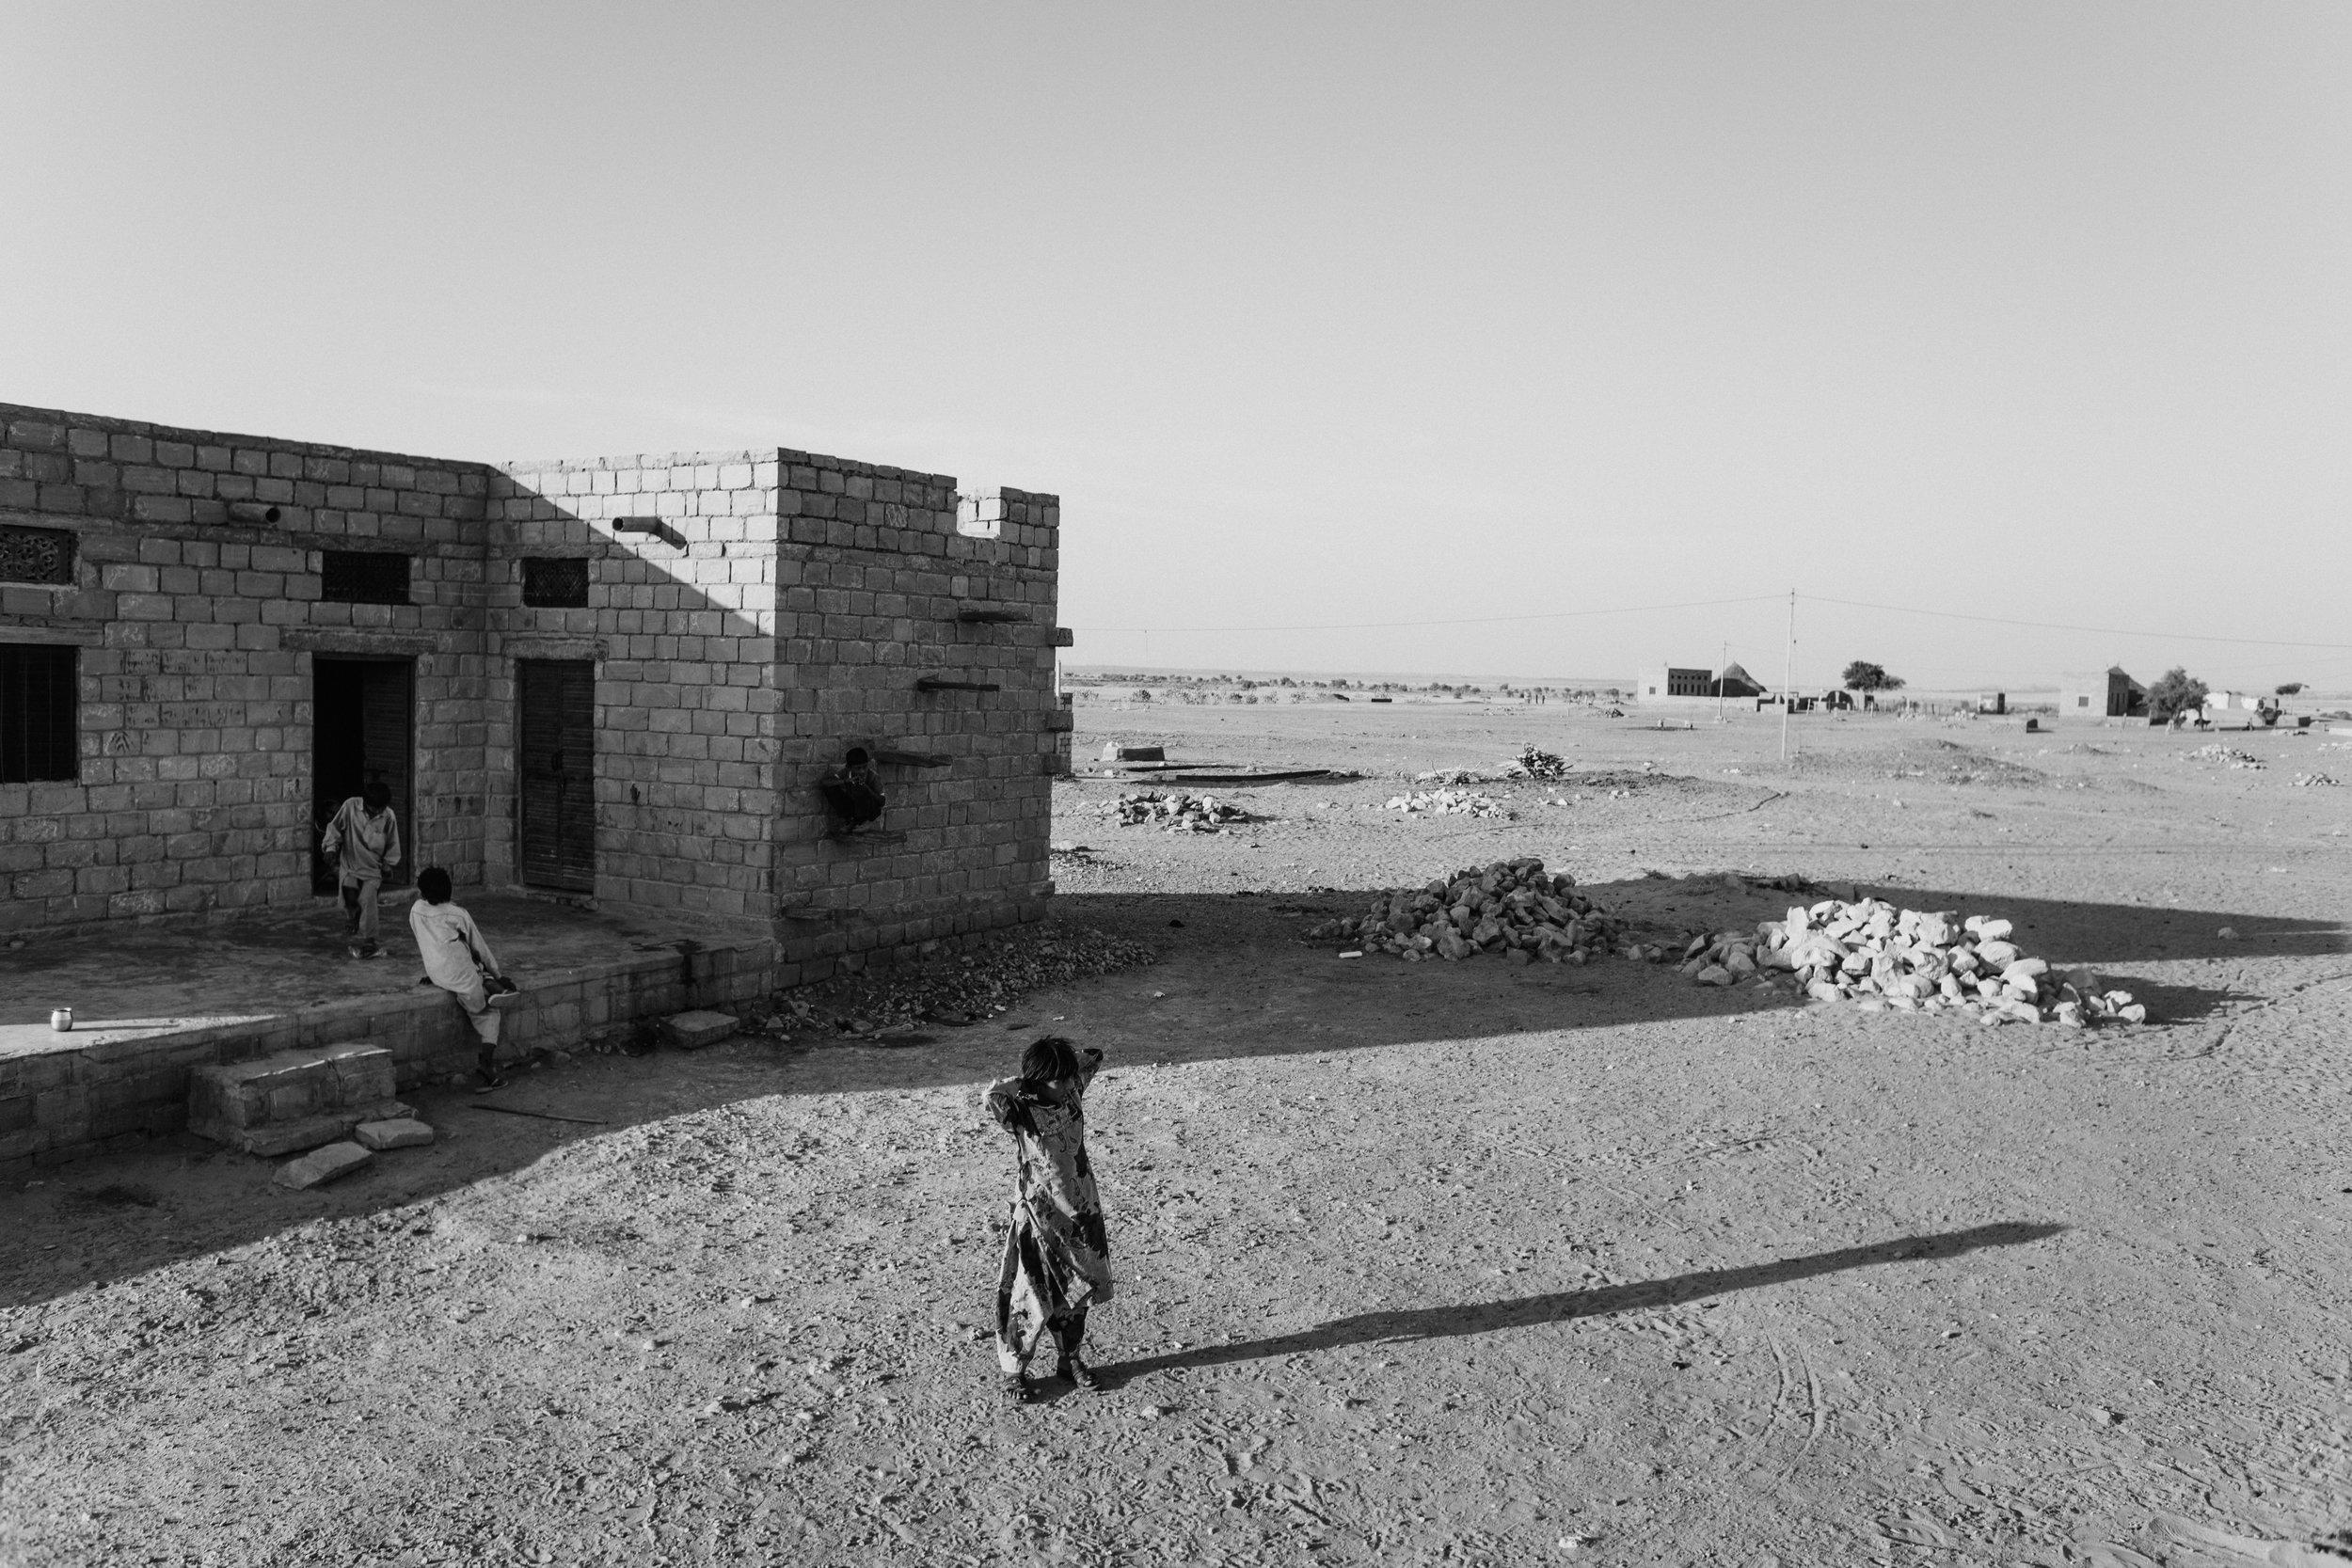 11.10.16 Jaisalmer Camel Safari 00142.jpg